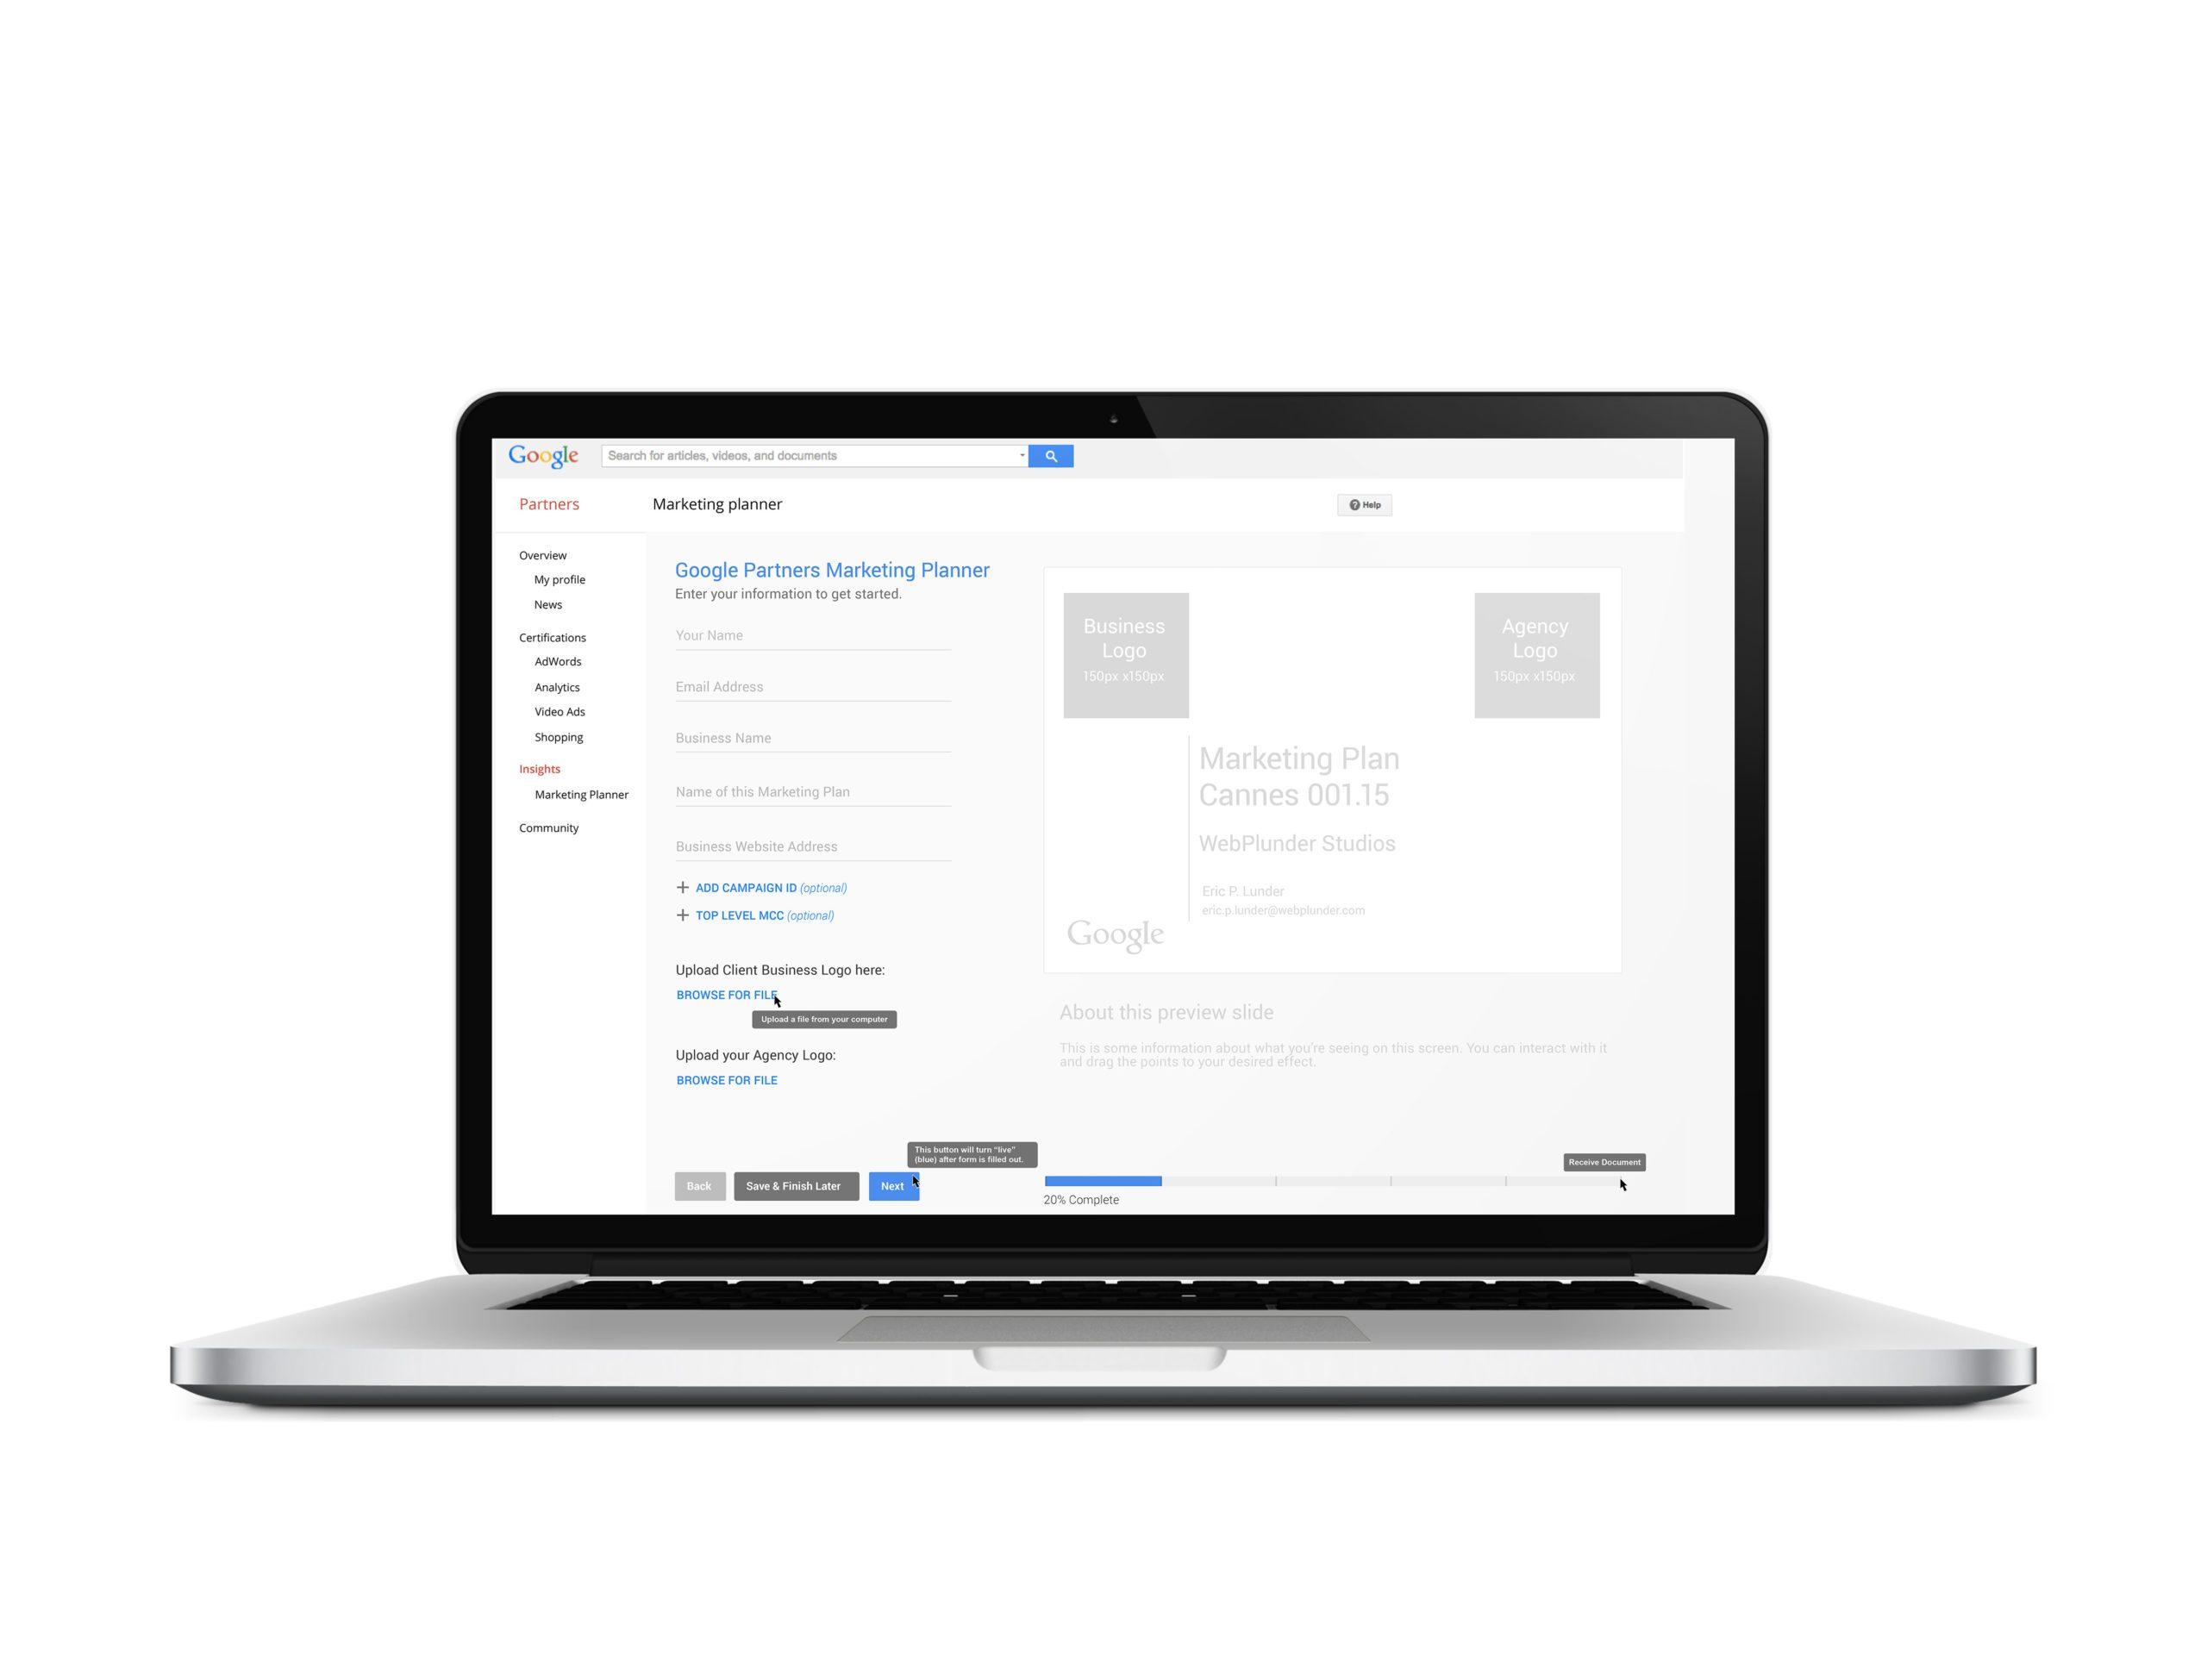 google-marketing-planner-macbook-screen2